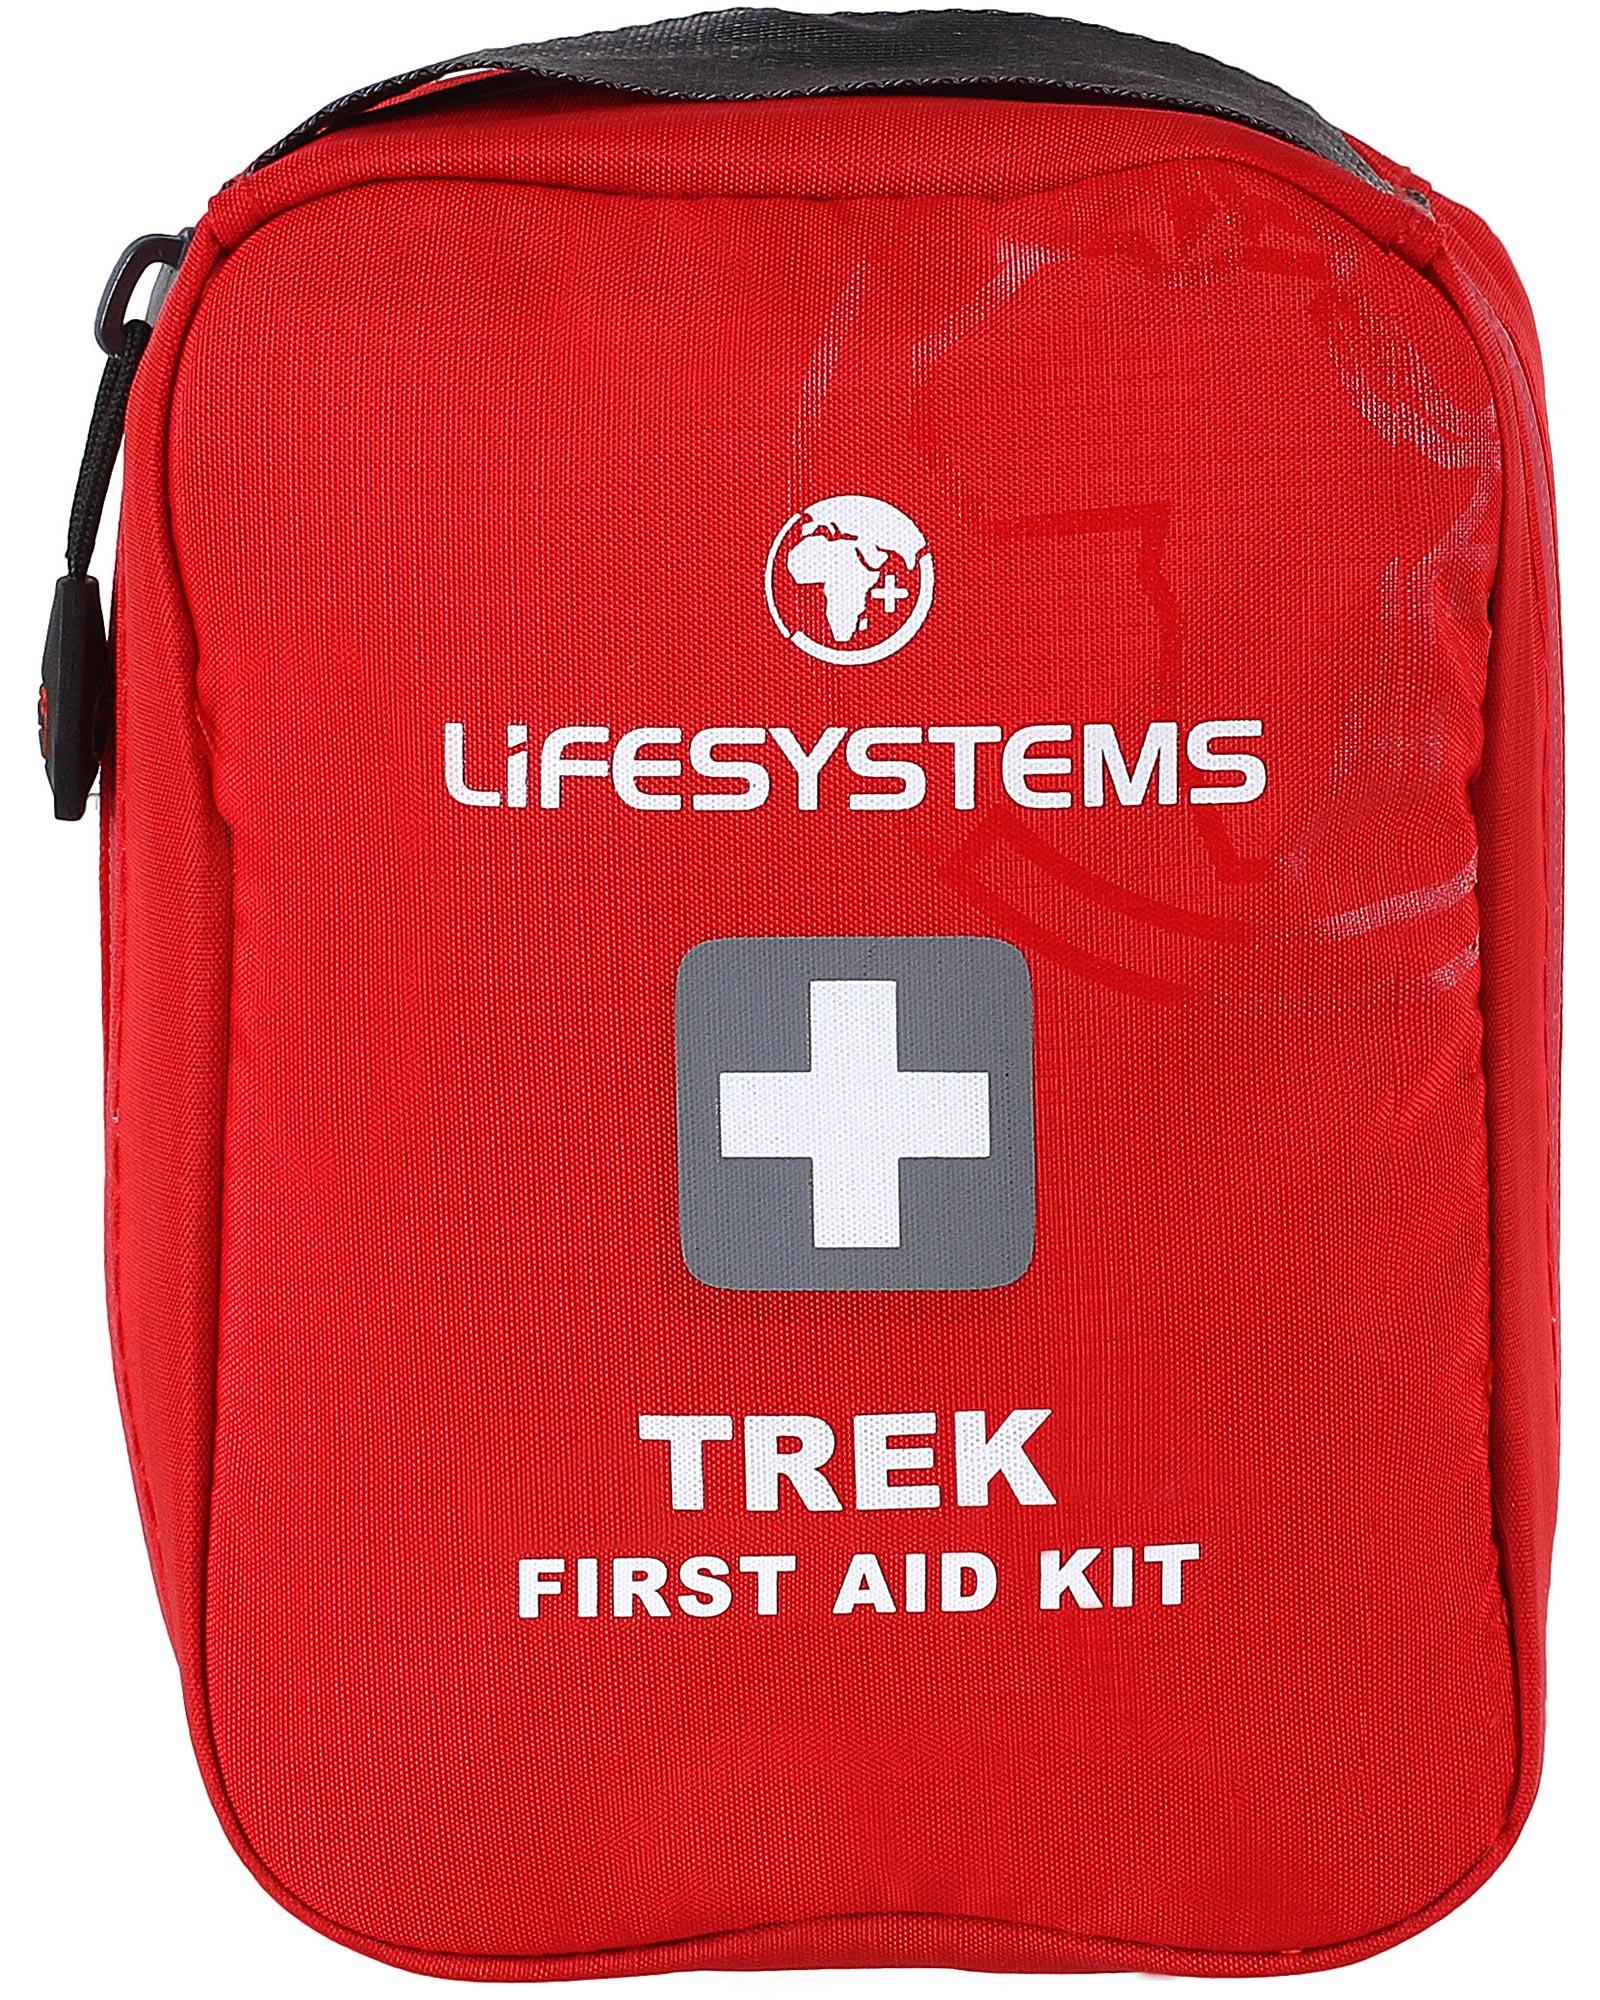 Lifesystems Trek First Aid Kit 0